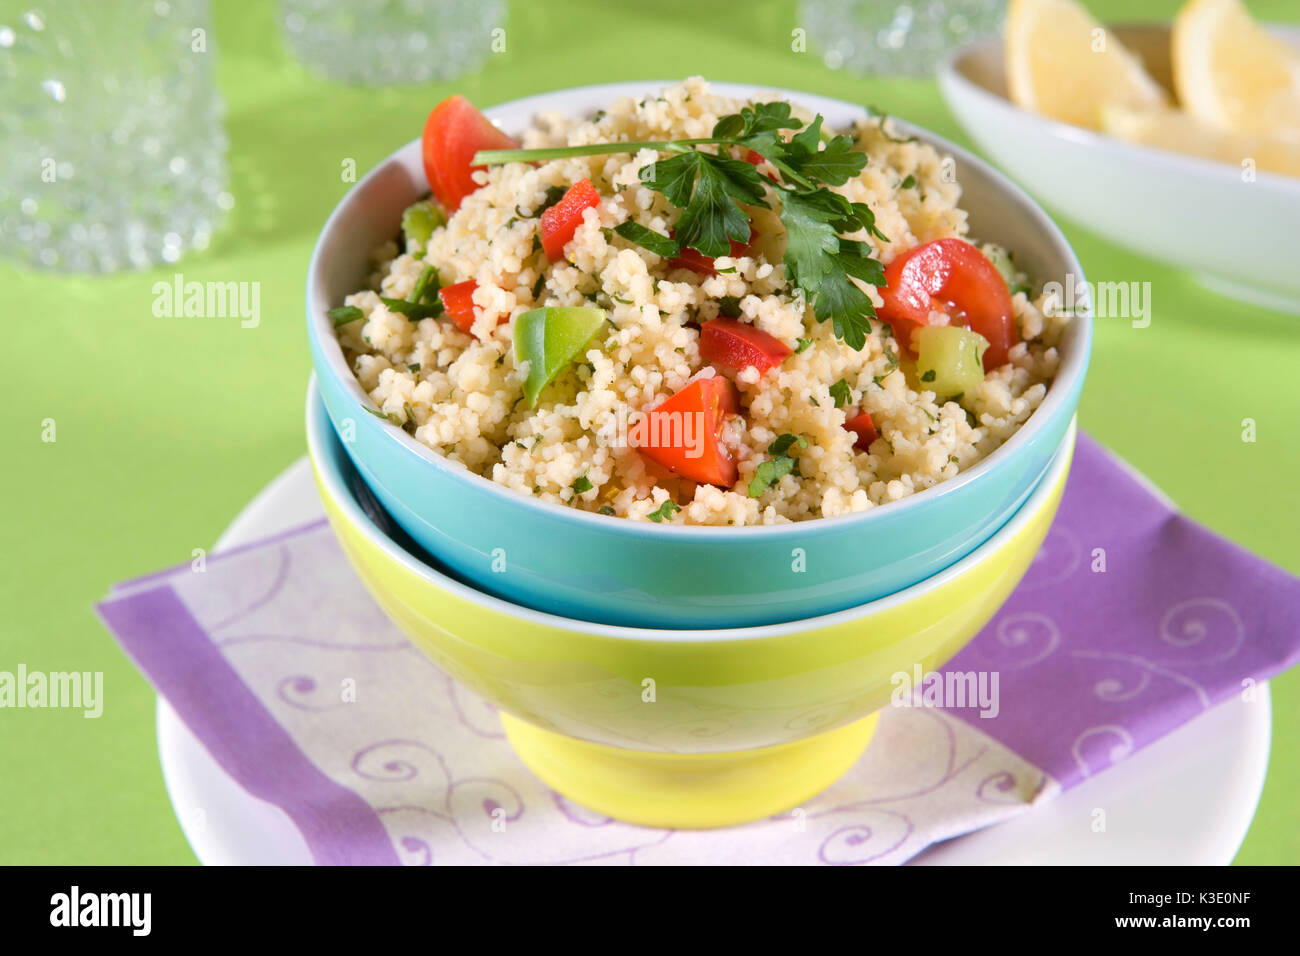 vegetarian dish, Taboulé, couscous salad, Lebanese parsley salad, coloured salad peels, - Stock Image